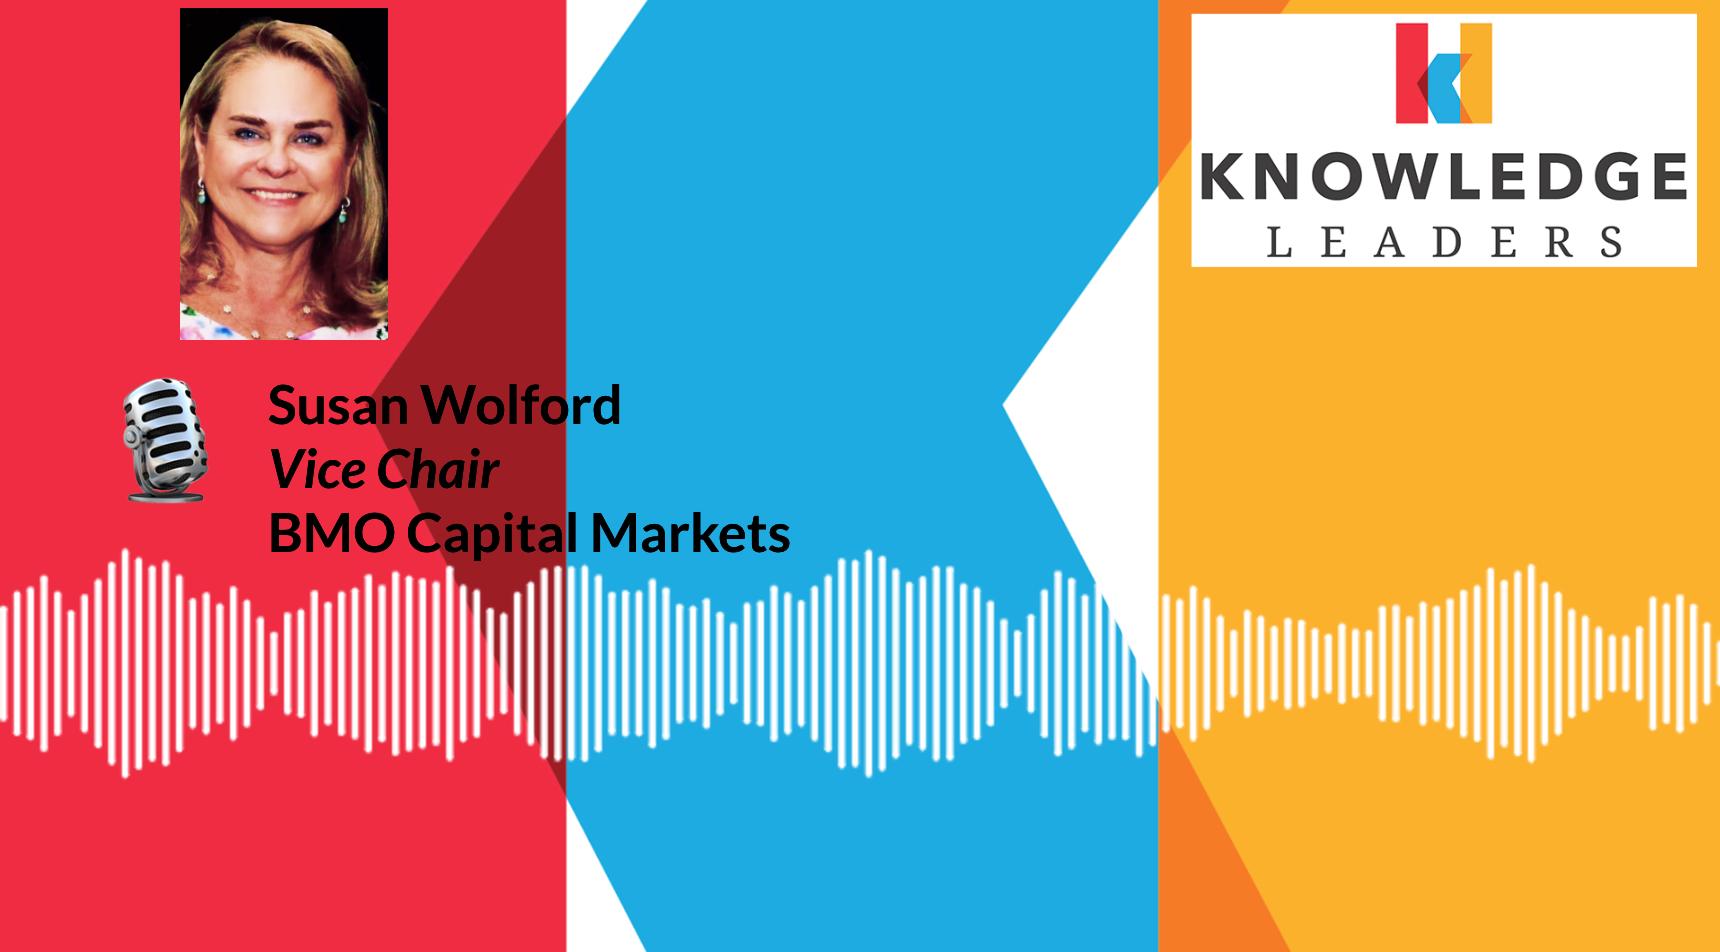 susan wolford bmo capital markets